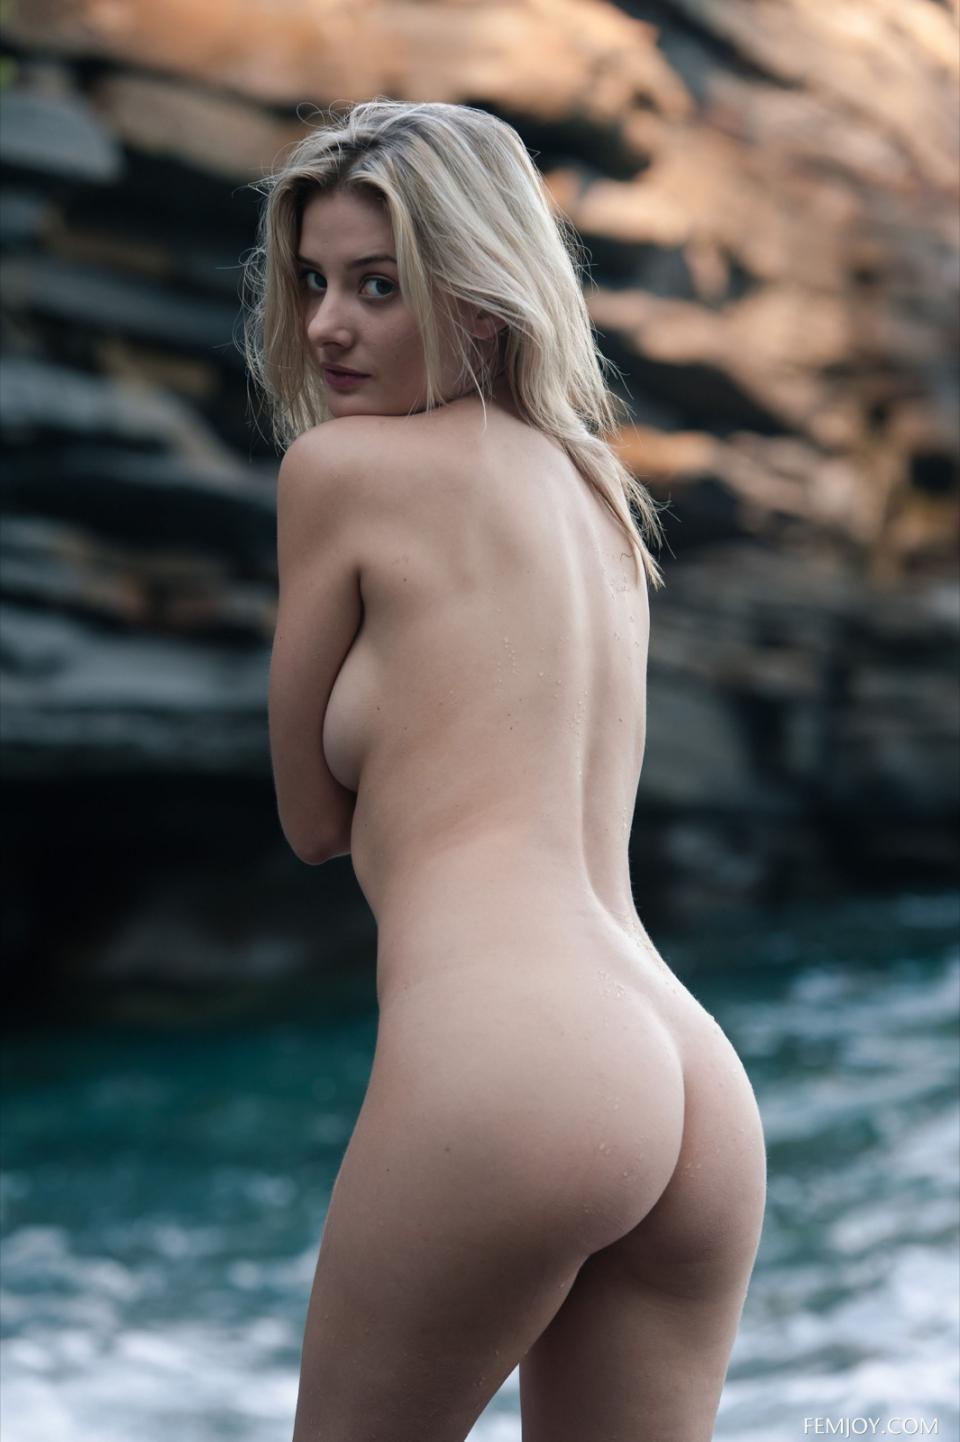 Consider, nude nudist skinny dipping